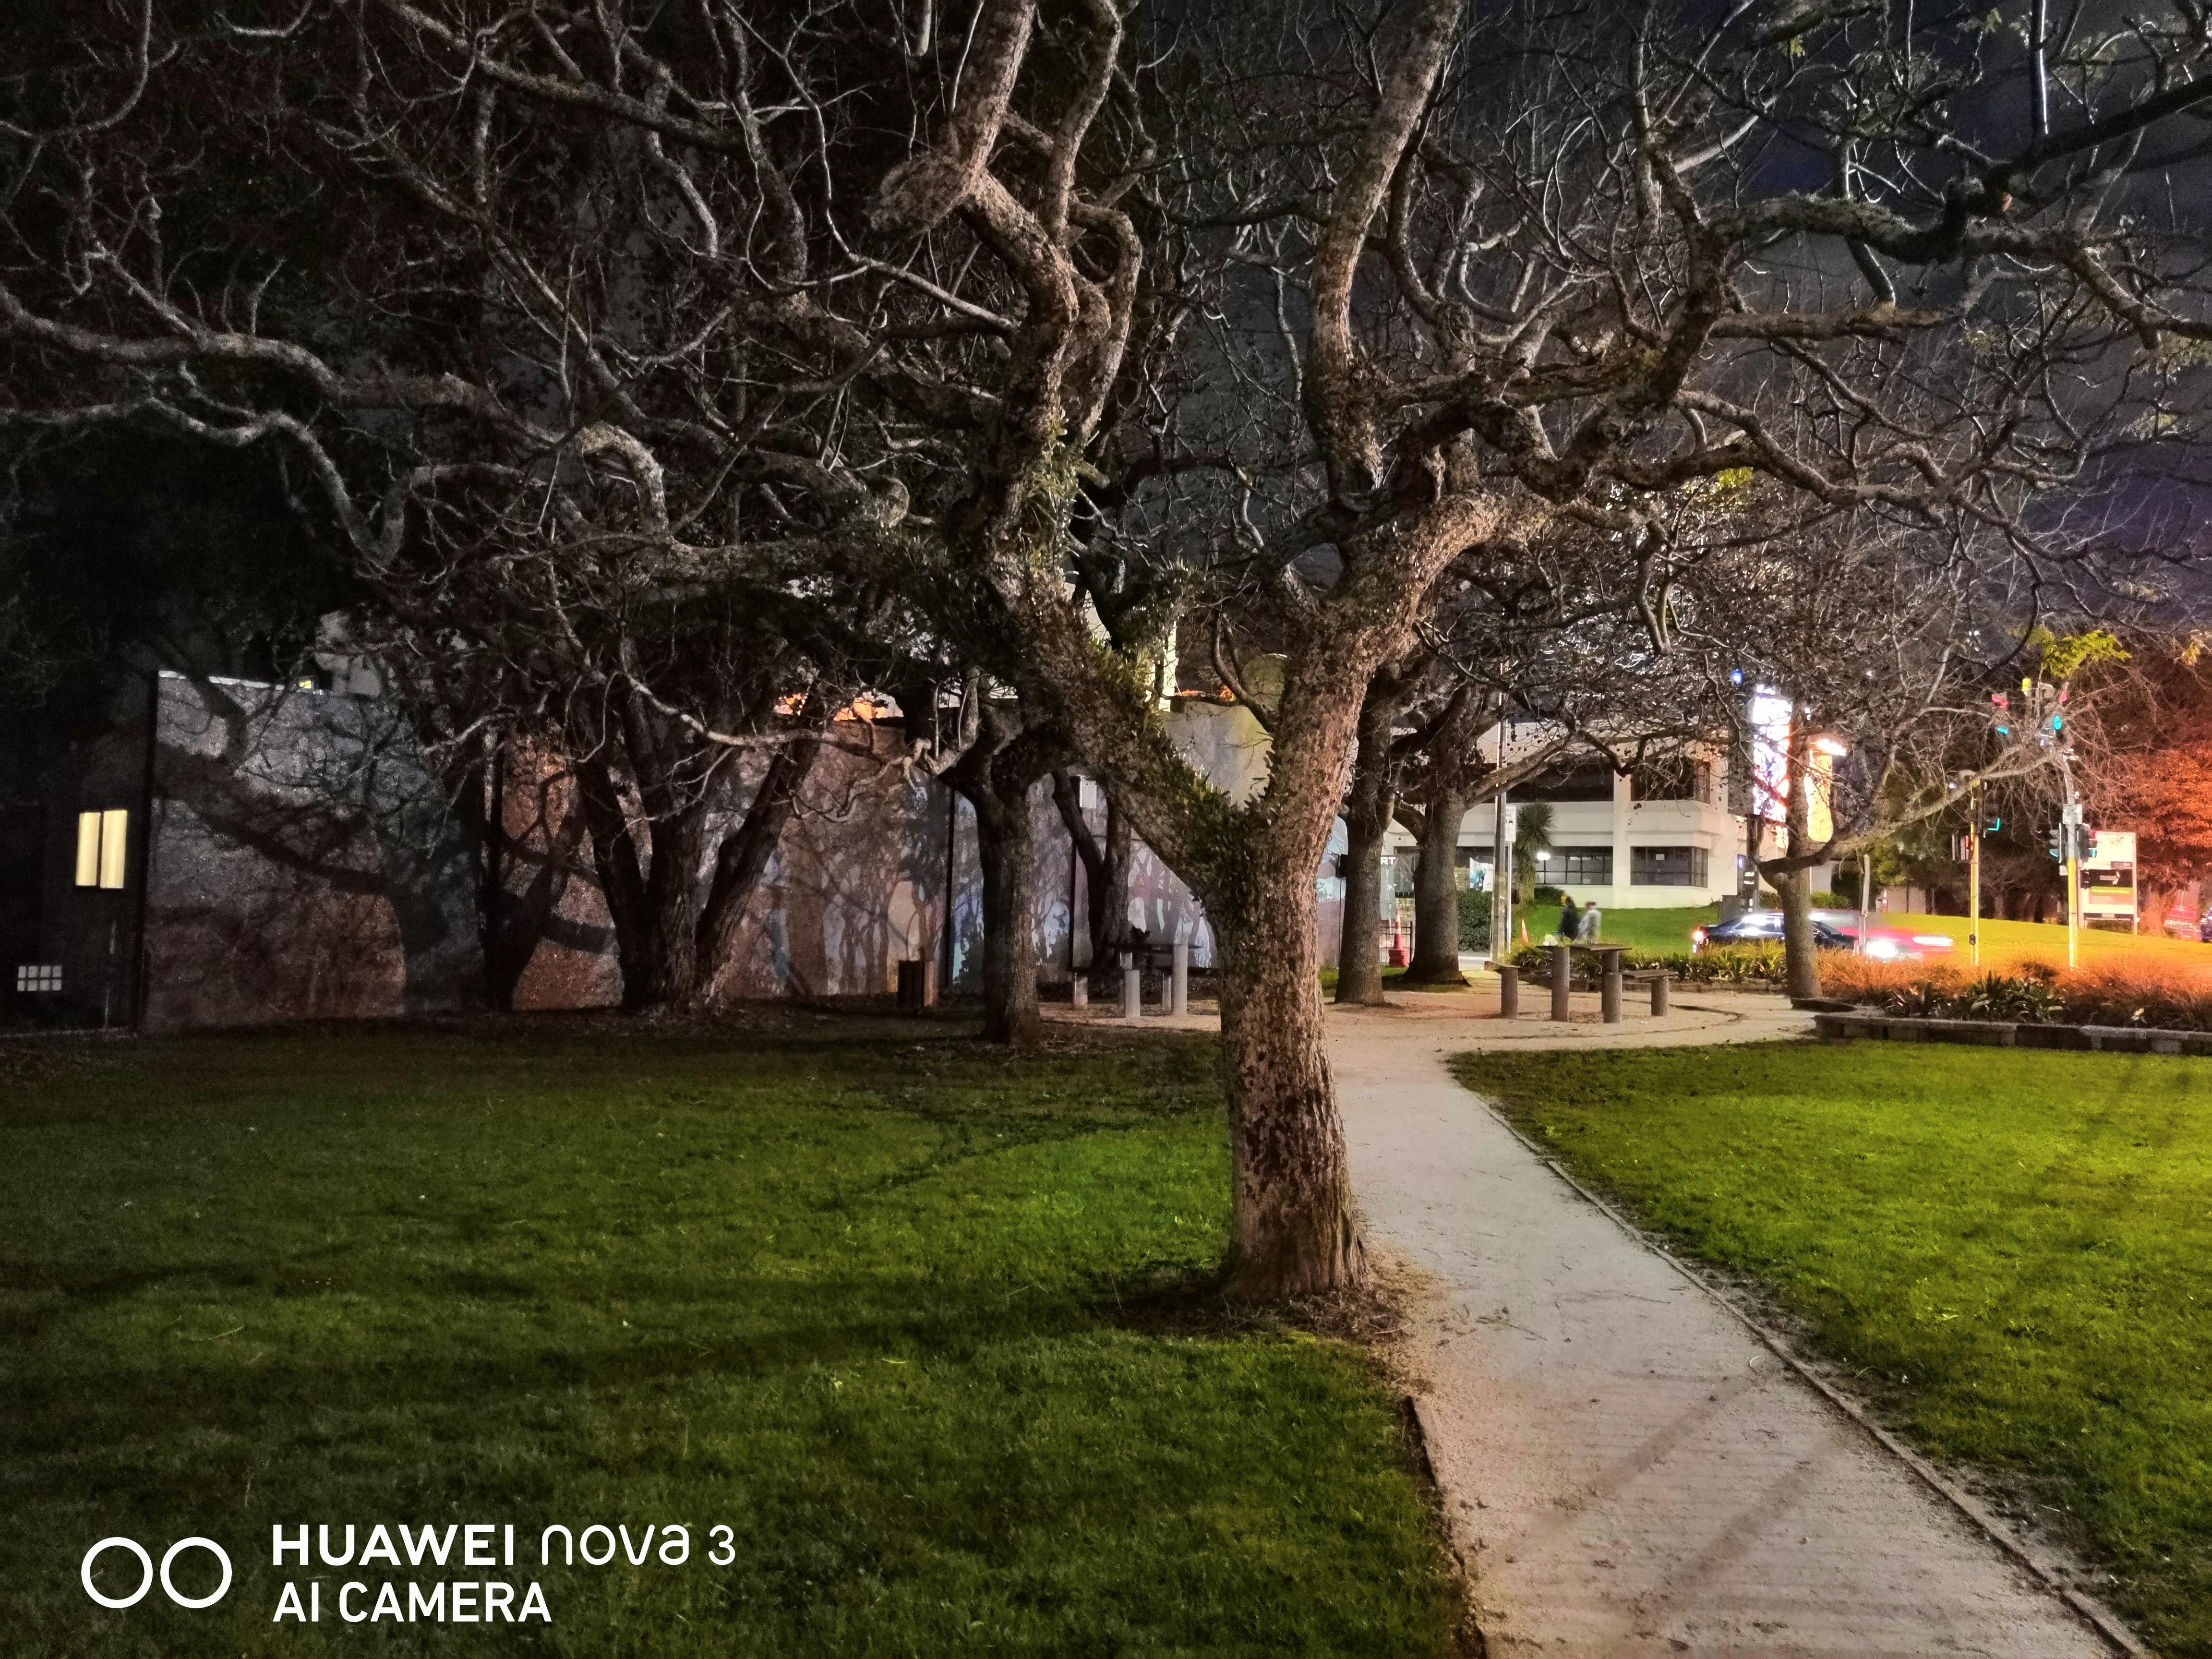 Huawei Nova 3 Camera Review – Review By Richard